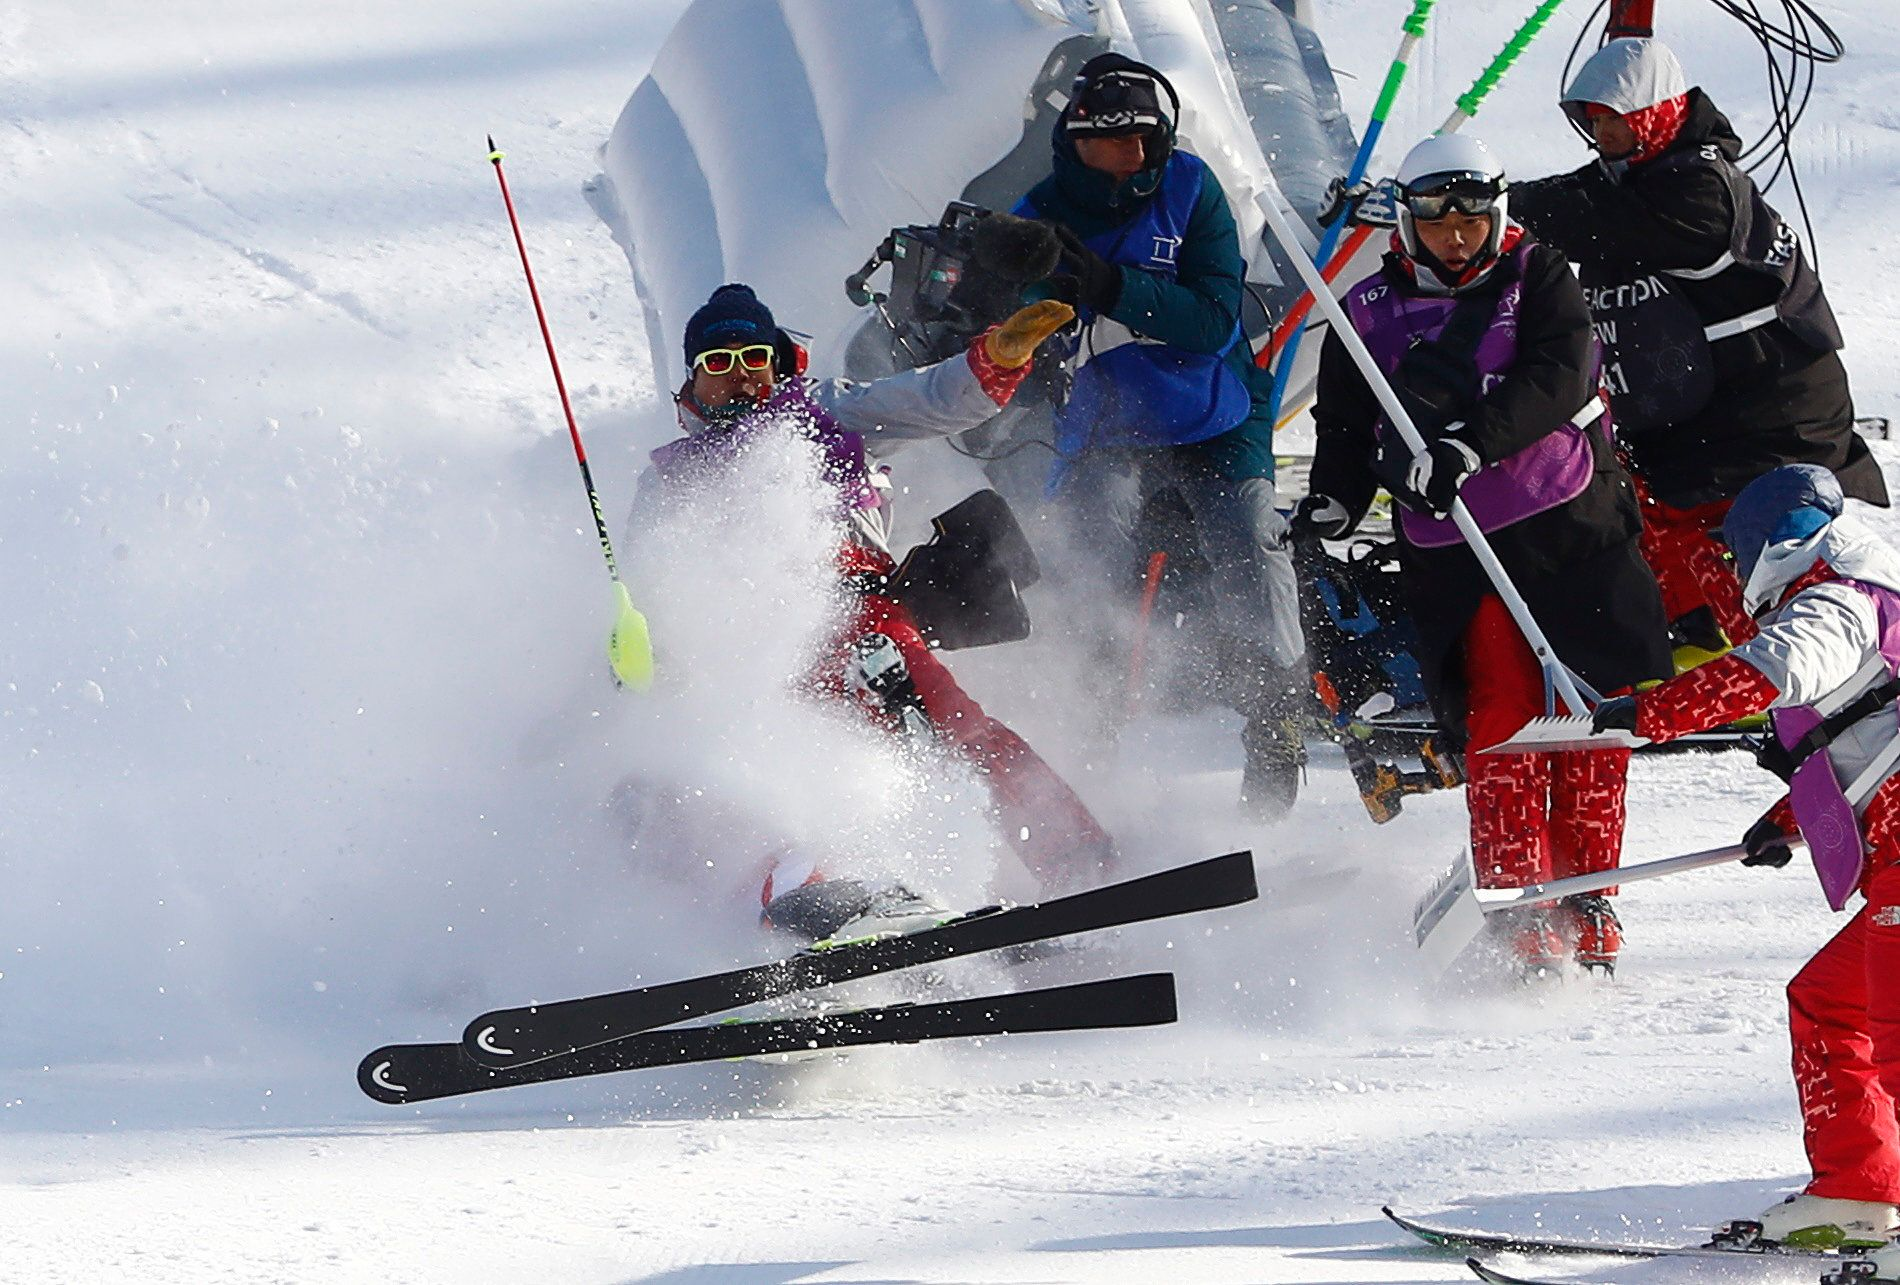 Alpine Skiing – Pyeongchang 2018 Winter Olympics – Men's Alpine Combined – Jeongseon Alpine Centre - Pyeongchang, South Korea – February 13, 2018 - Matthias Mayer of Austria crashes into media personnel during the Men's Slalom part of the Men's Alpine Combined. REUTERS/Dominic Ebenbichler